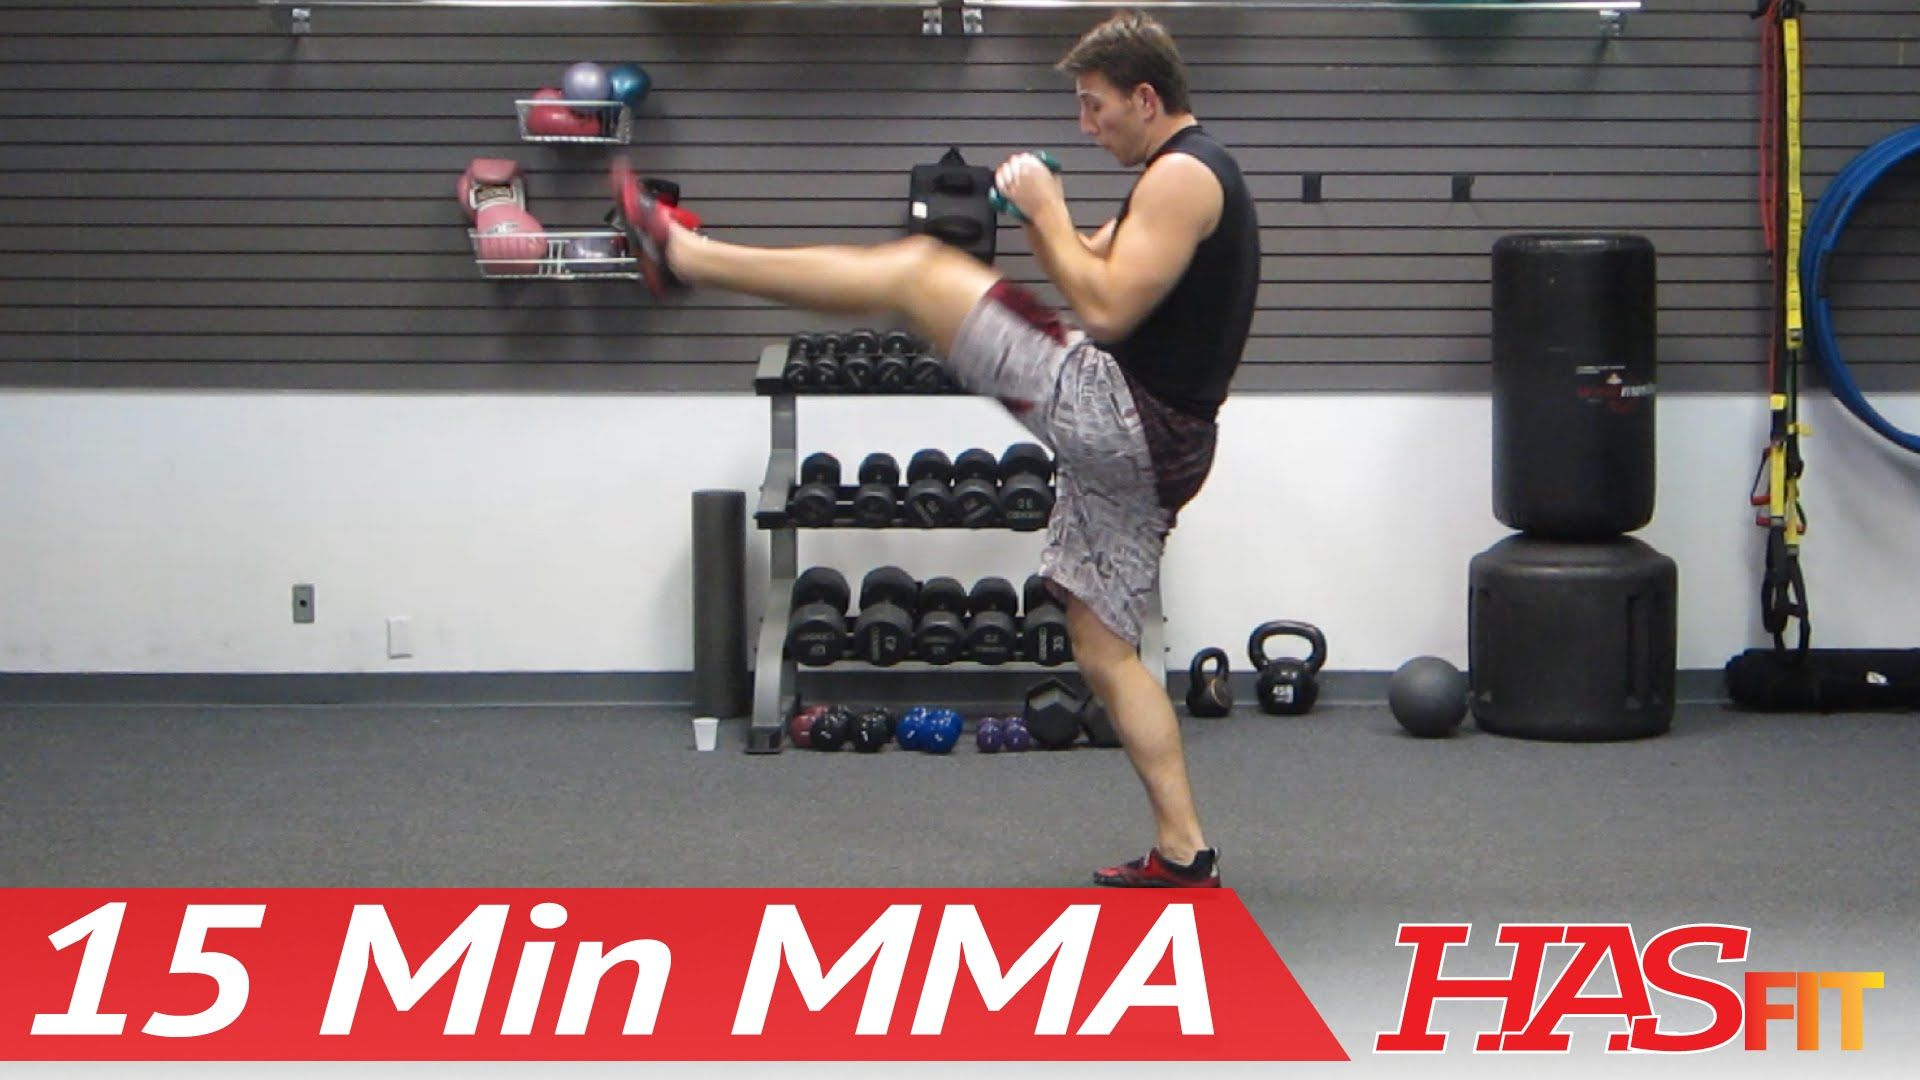 UFC TRAINING MMA WORKOUT - 15 Min MMA Training Conditioning Workouts https://www.youtube.com/watch?v=uaG3arfzdP8 #mma #workout